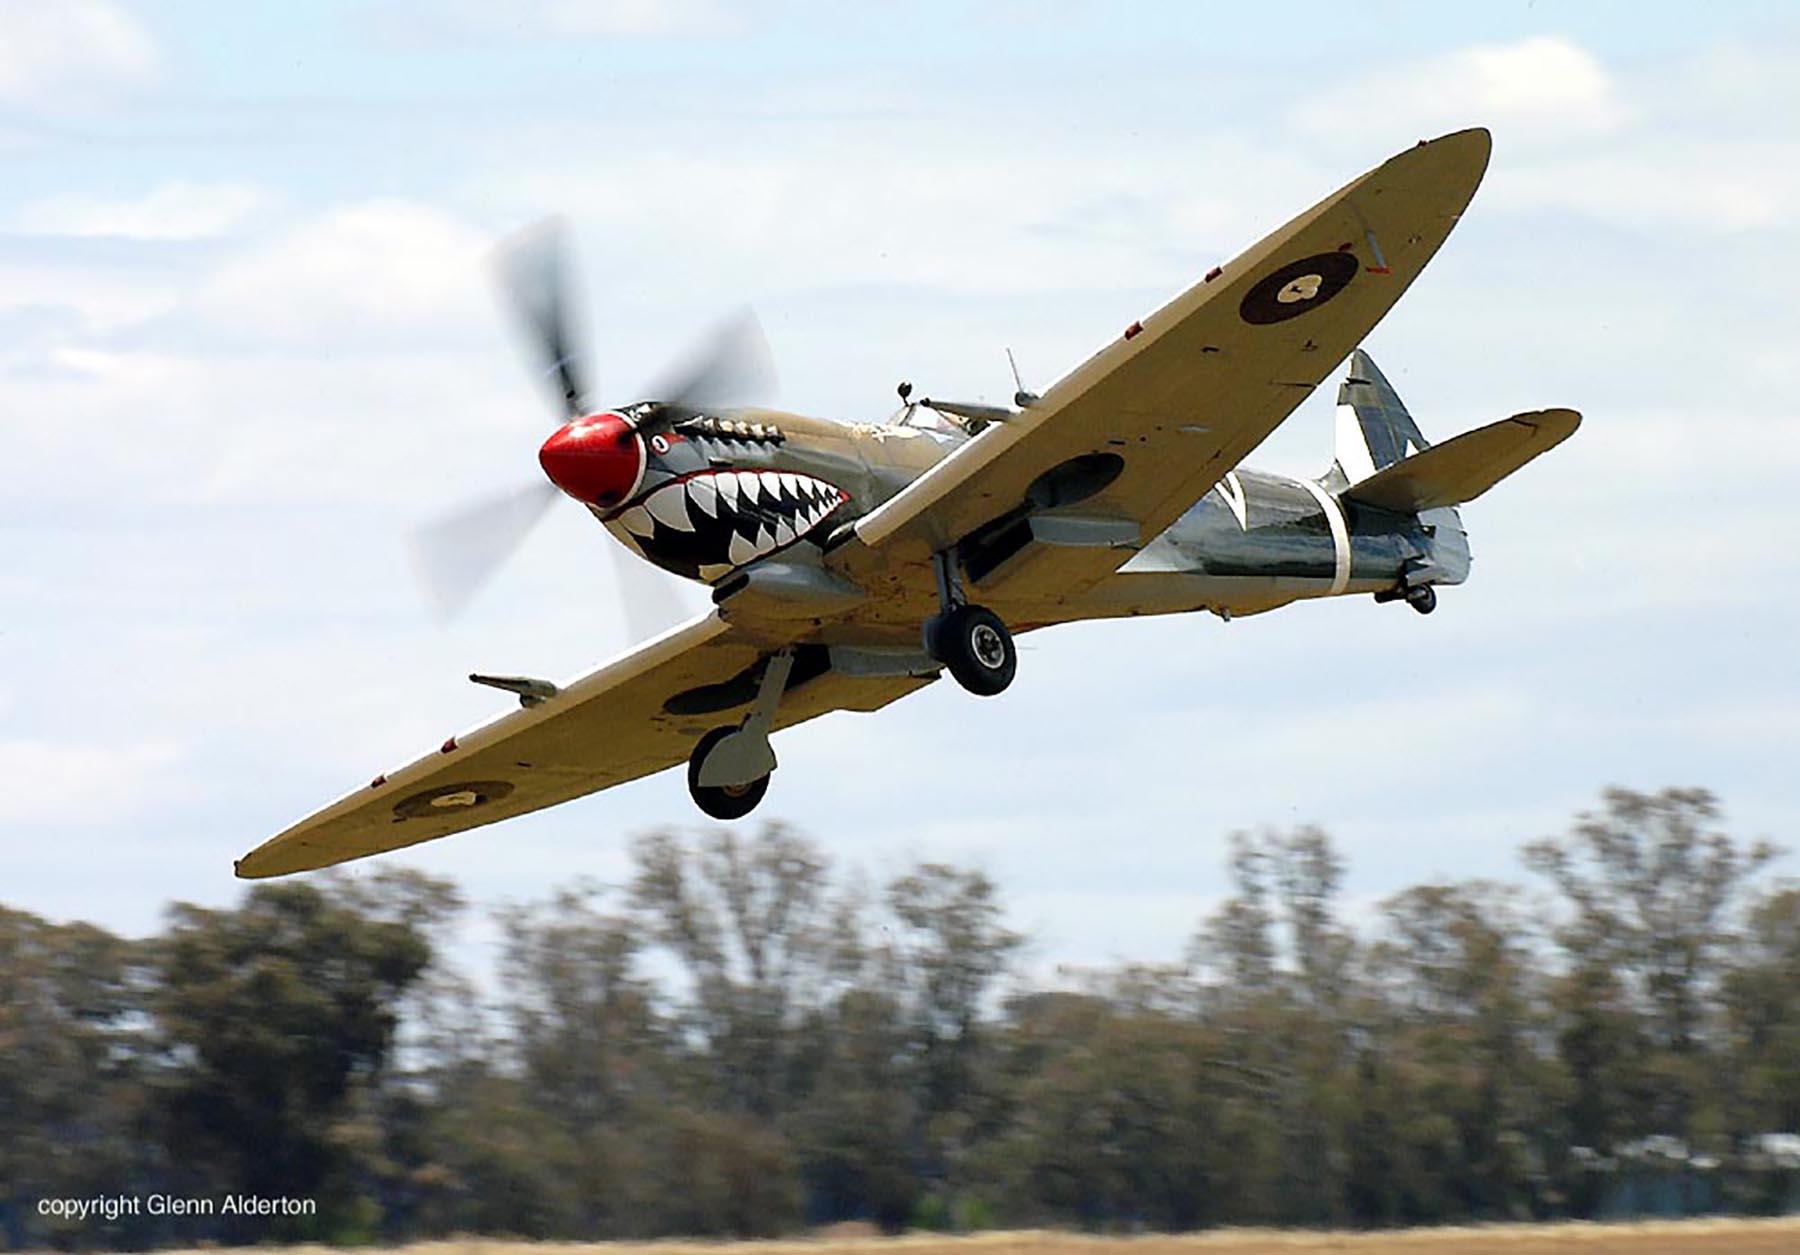 Airworthy Spitfire warbird RAAF 457Sqn RGV A58 602 11